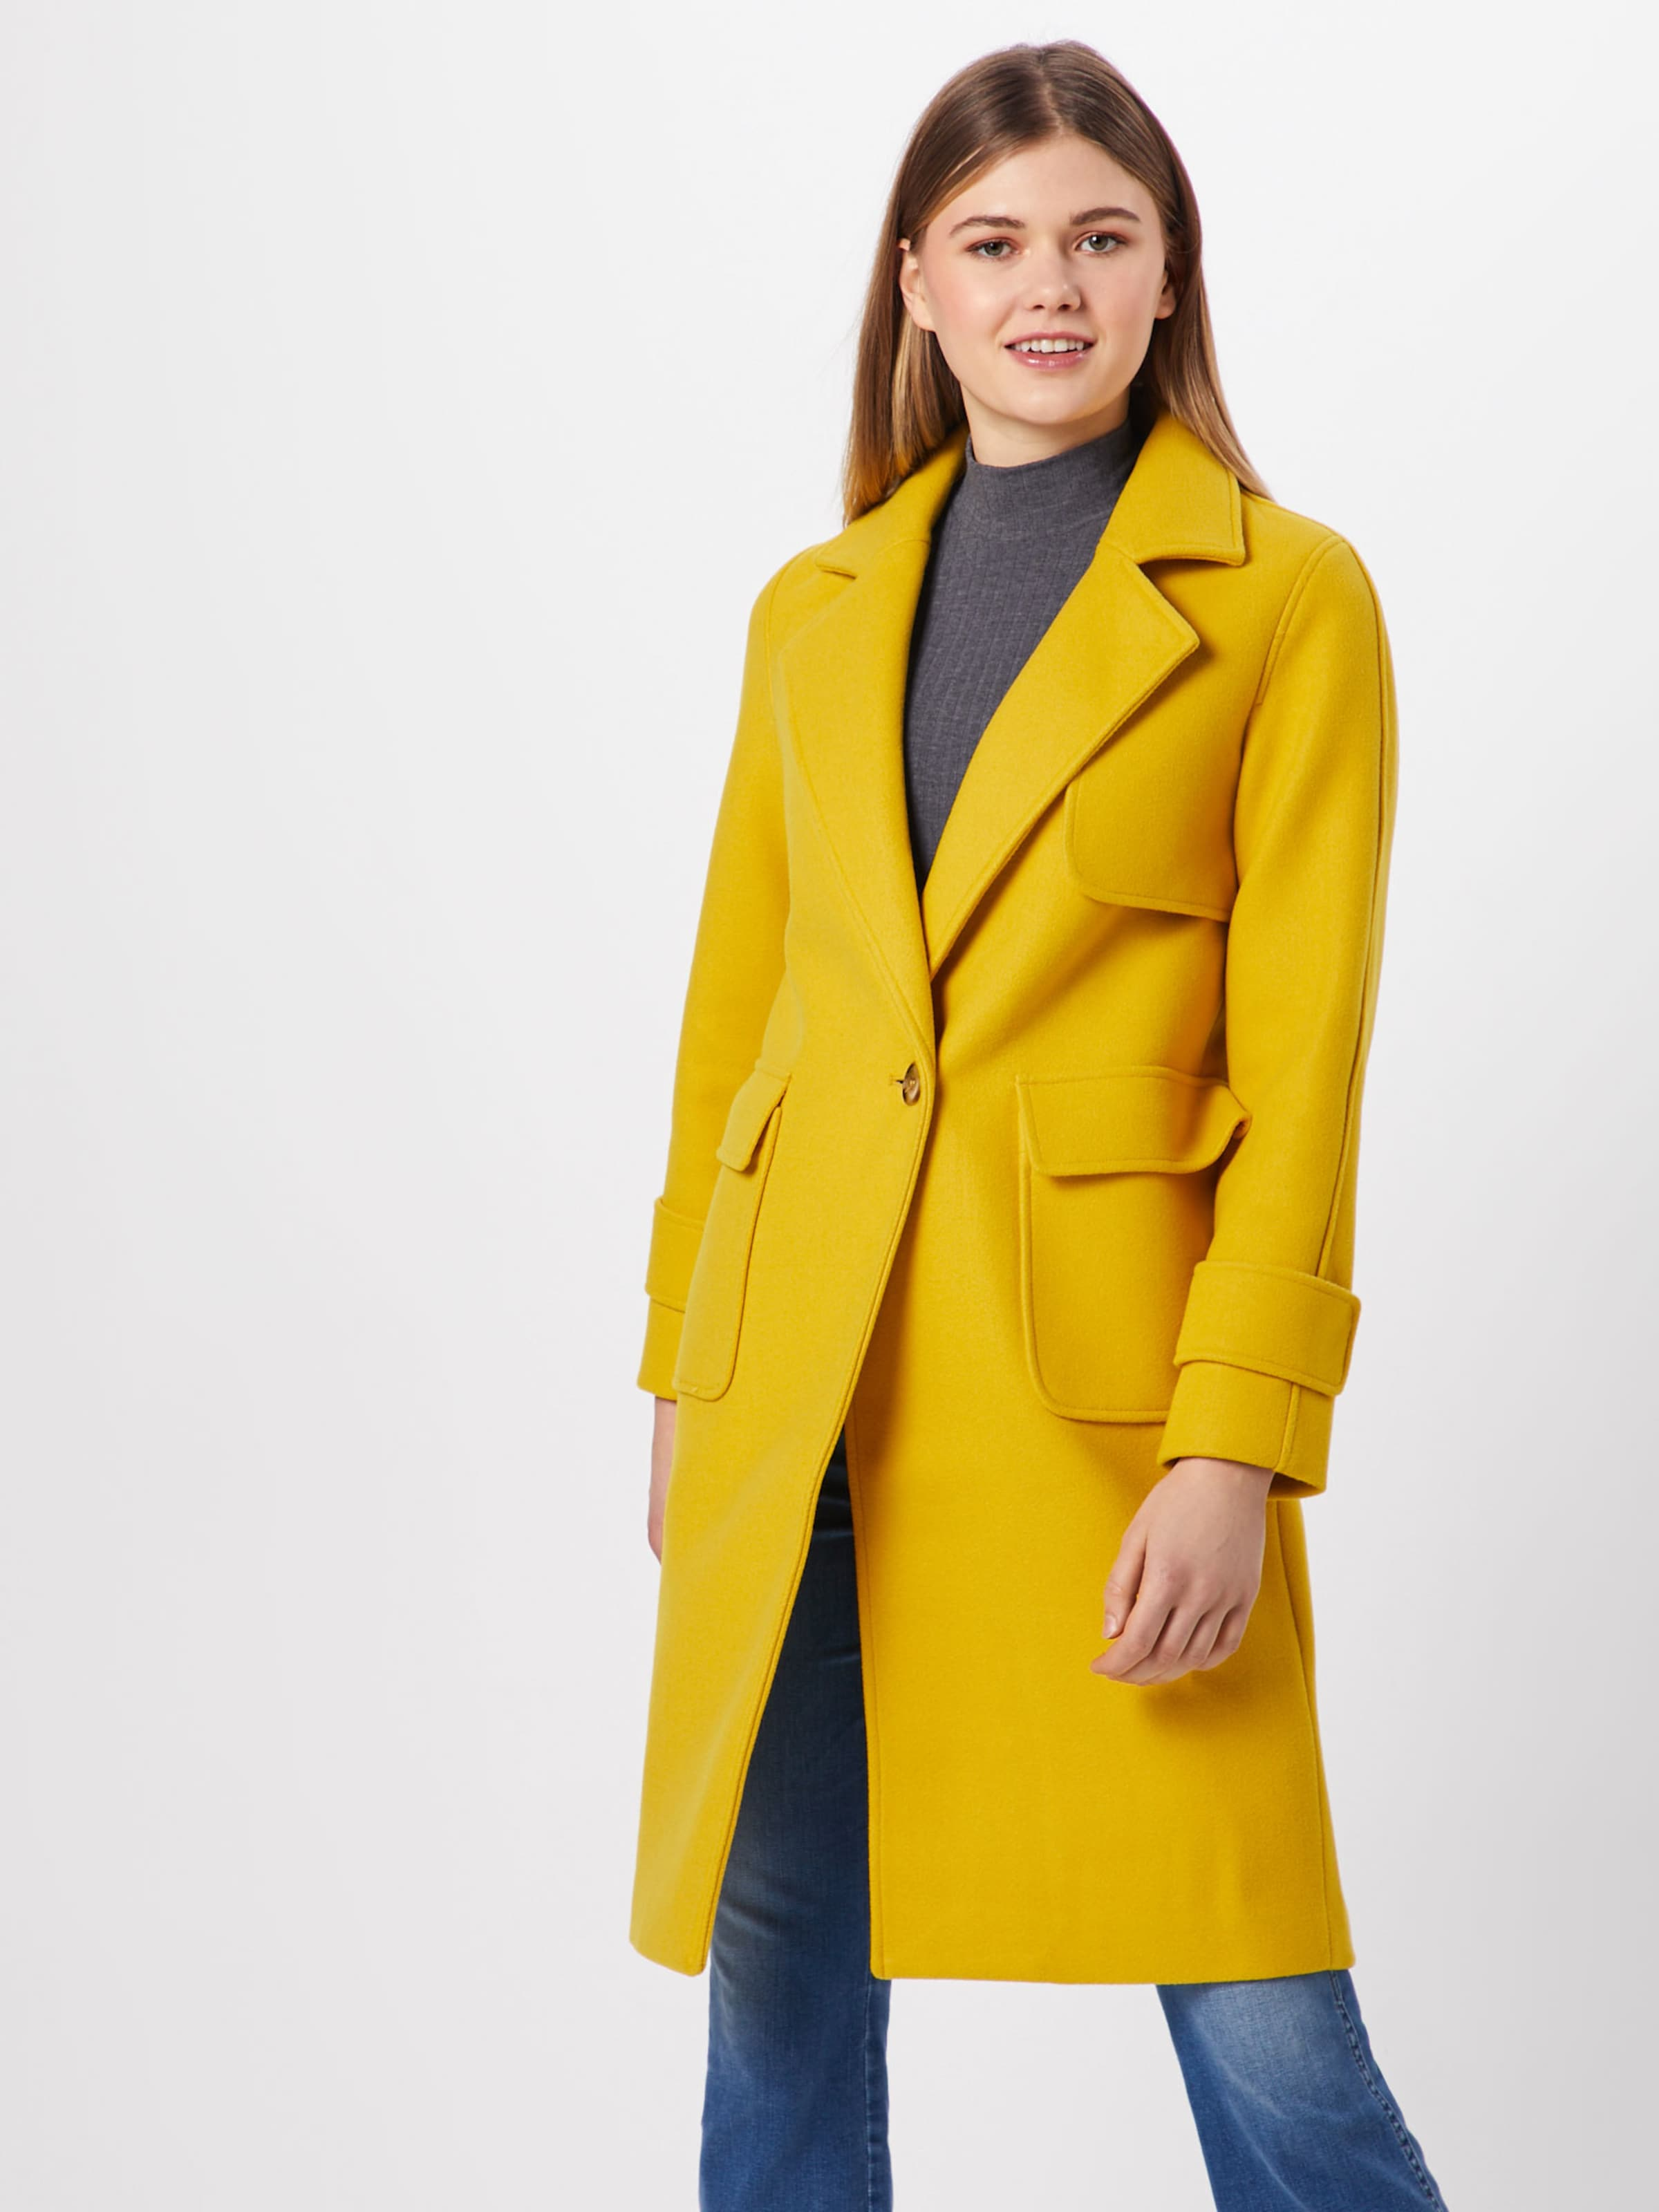 amp;odd 'coat Senf Mantel Even Button' Horn In With KFcTlJ31